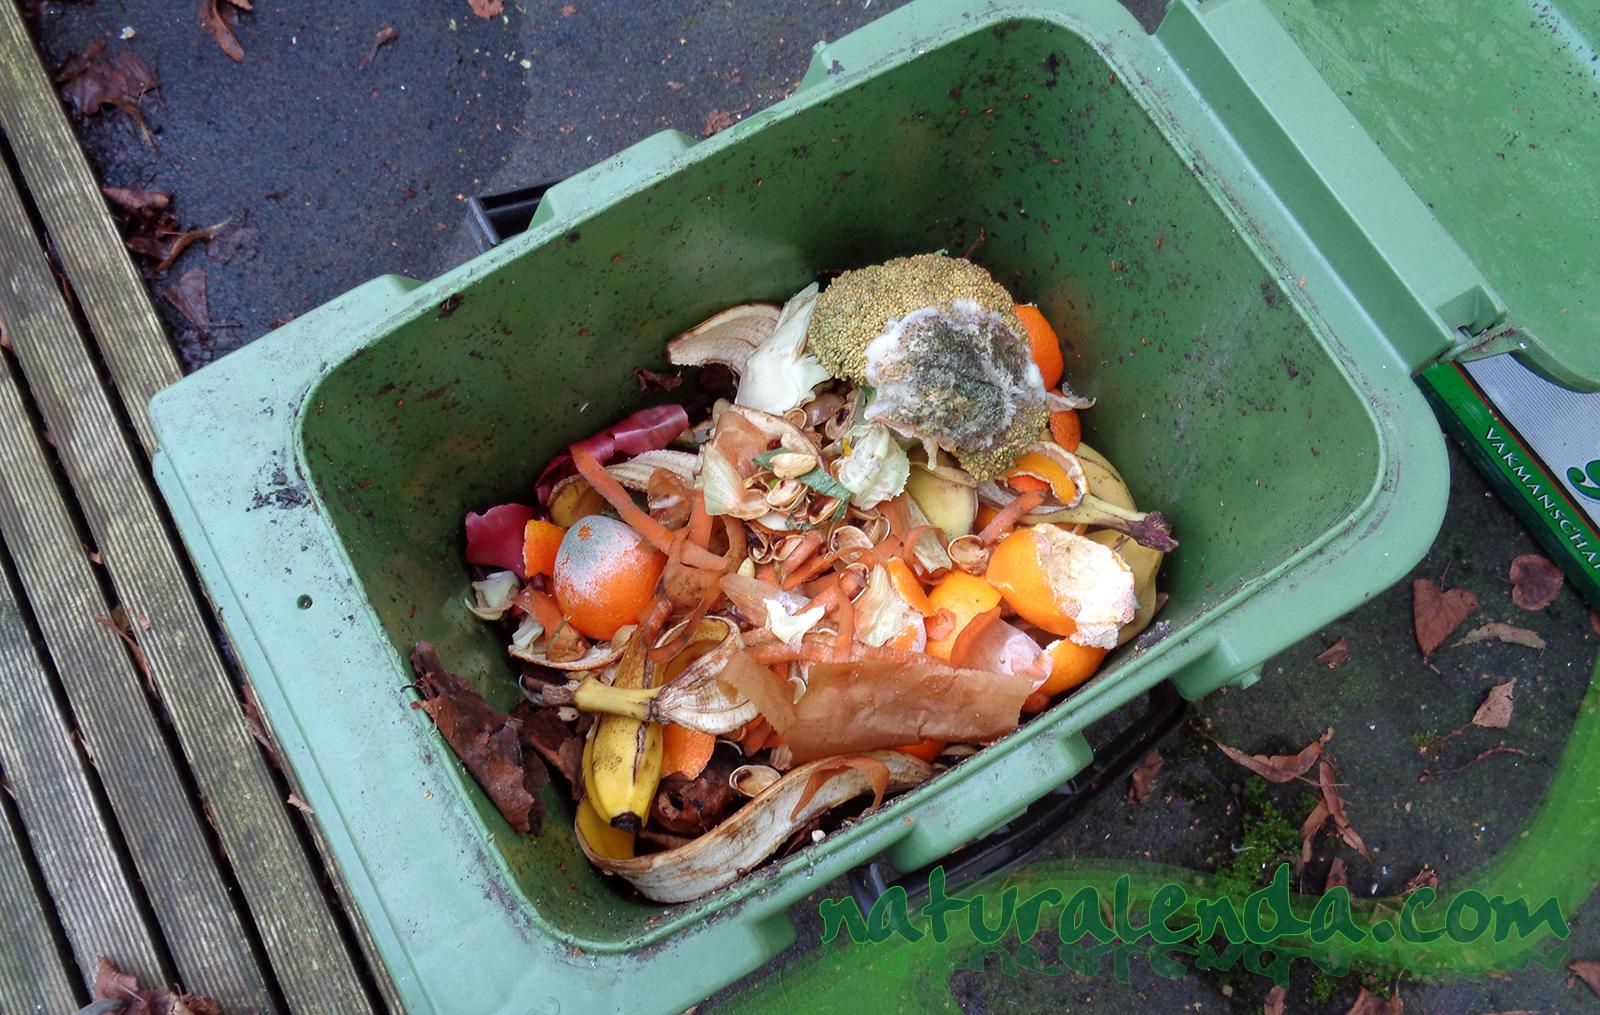 cubo de residuos organicos